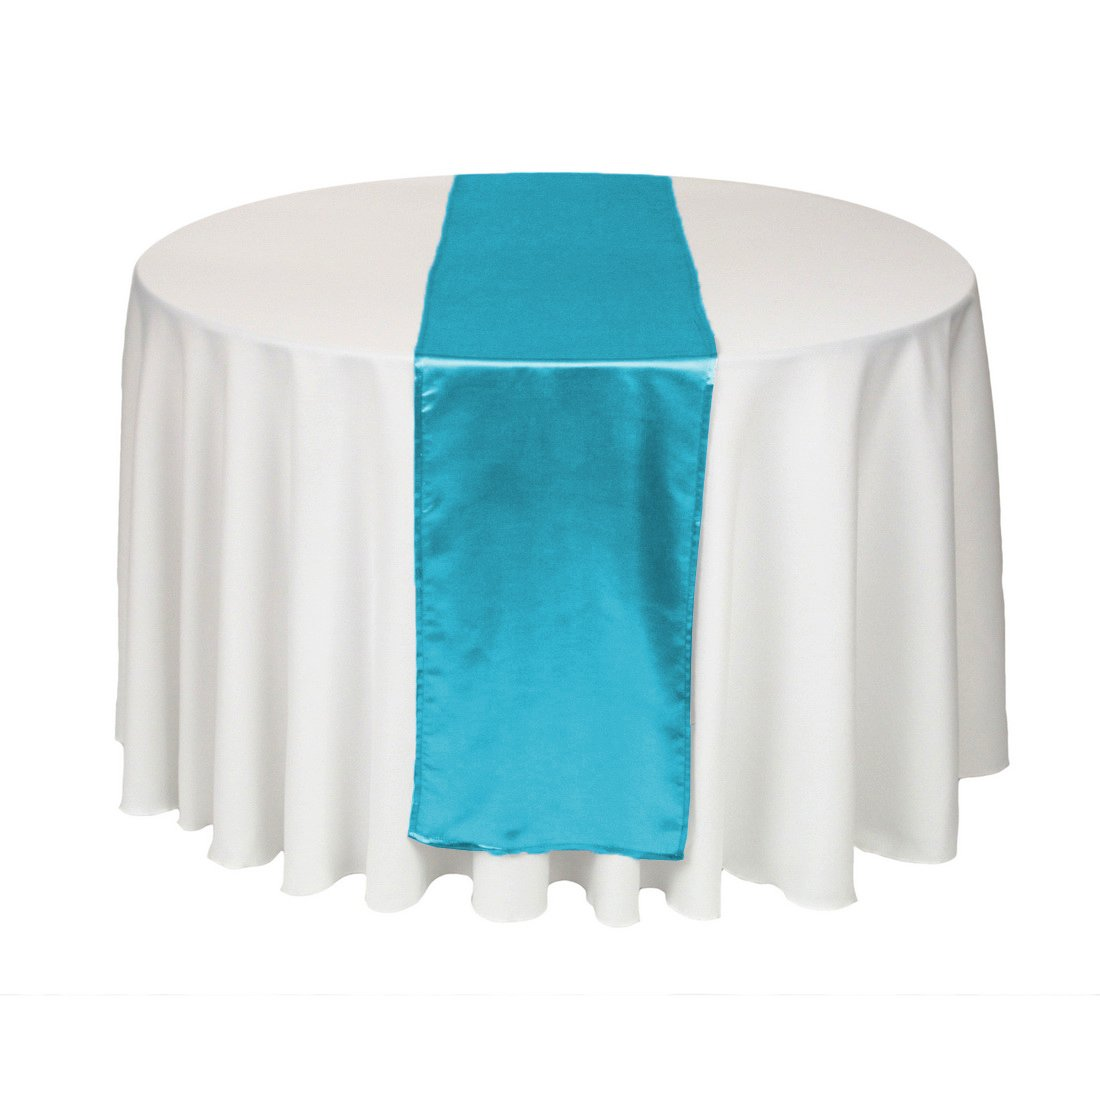 Amazon.com: LinenTablecloth 14 X 108 Inch Satin Table Runner Caribbean:  Home U0026 Kitchen